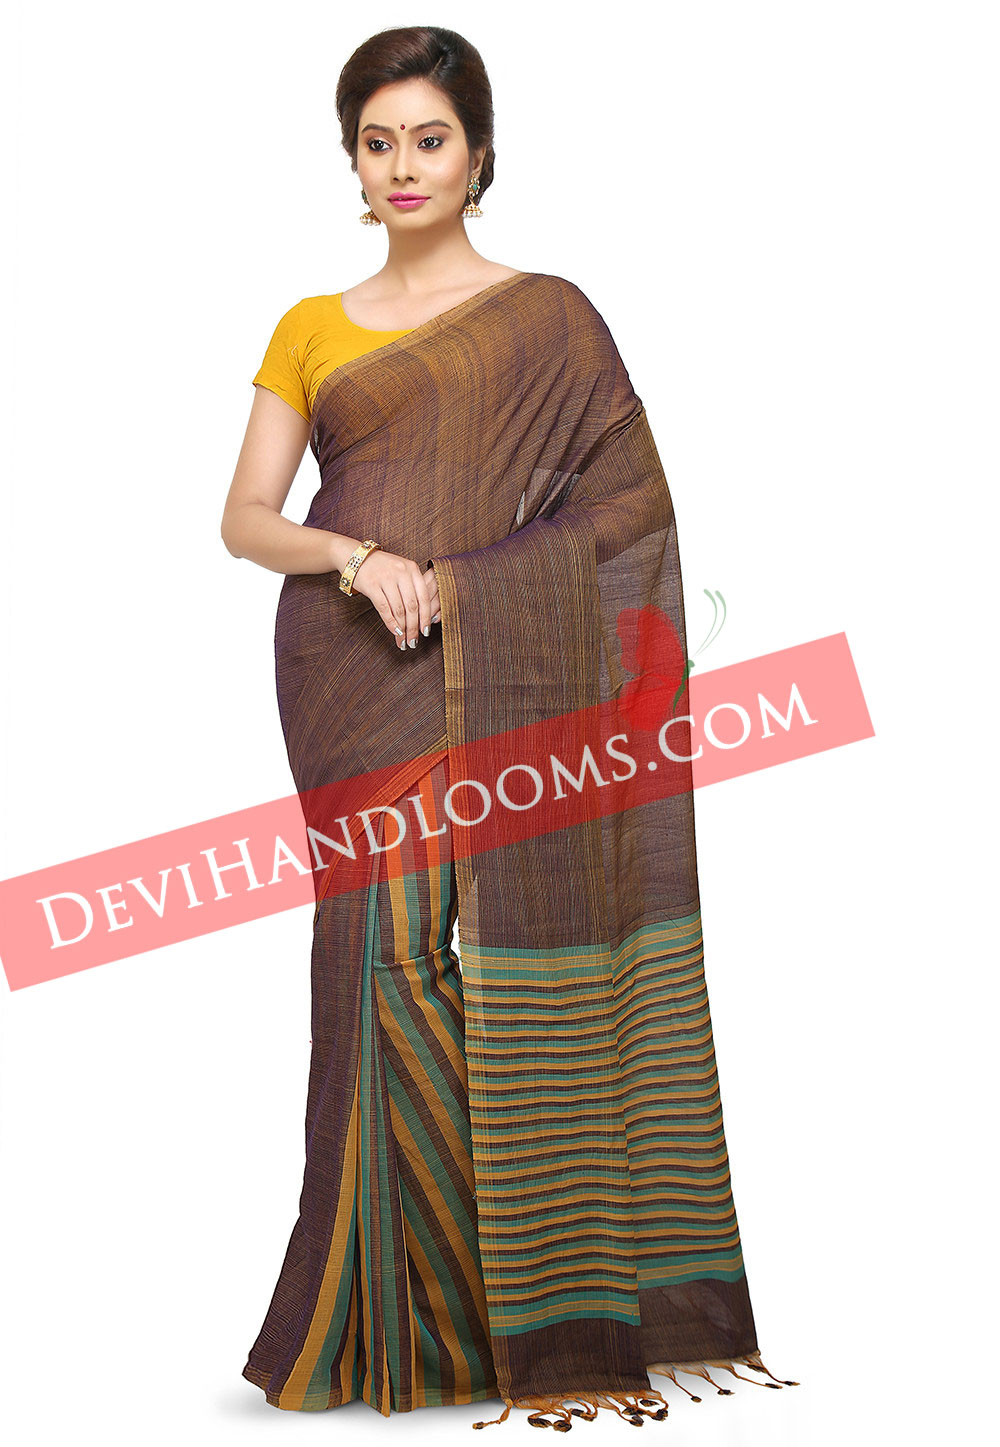 https://devihandlooms.com/shop/wp-content/uploads/Mangalagiri-Cotton-sarees-41.jpg